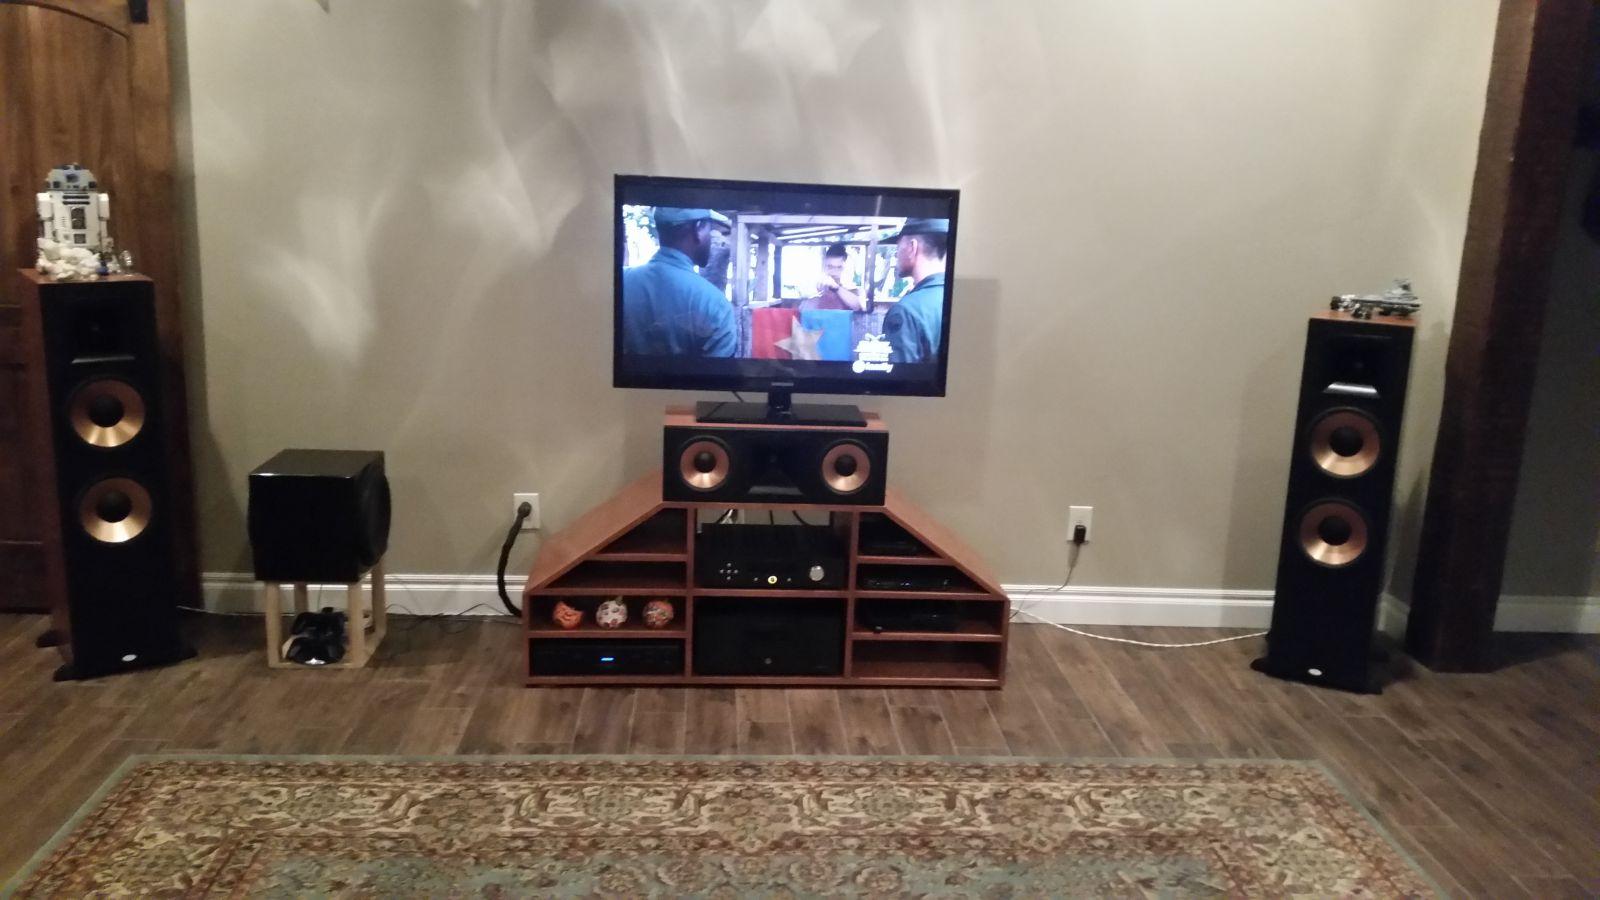 3.1 Set Up